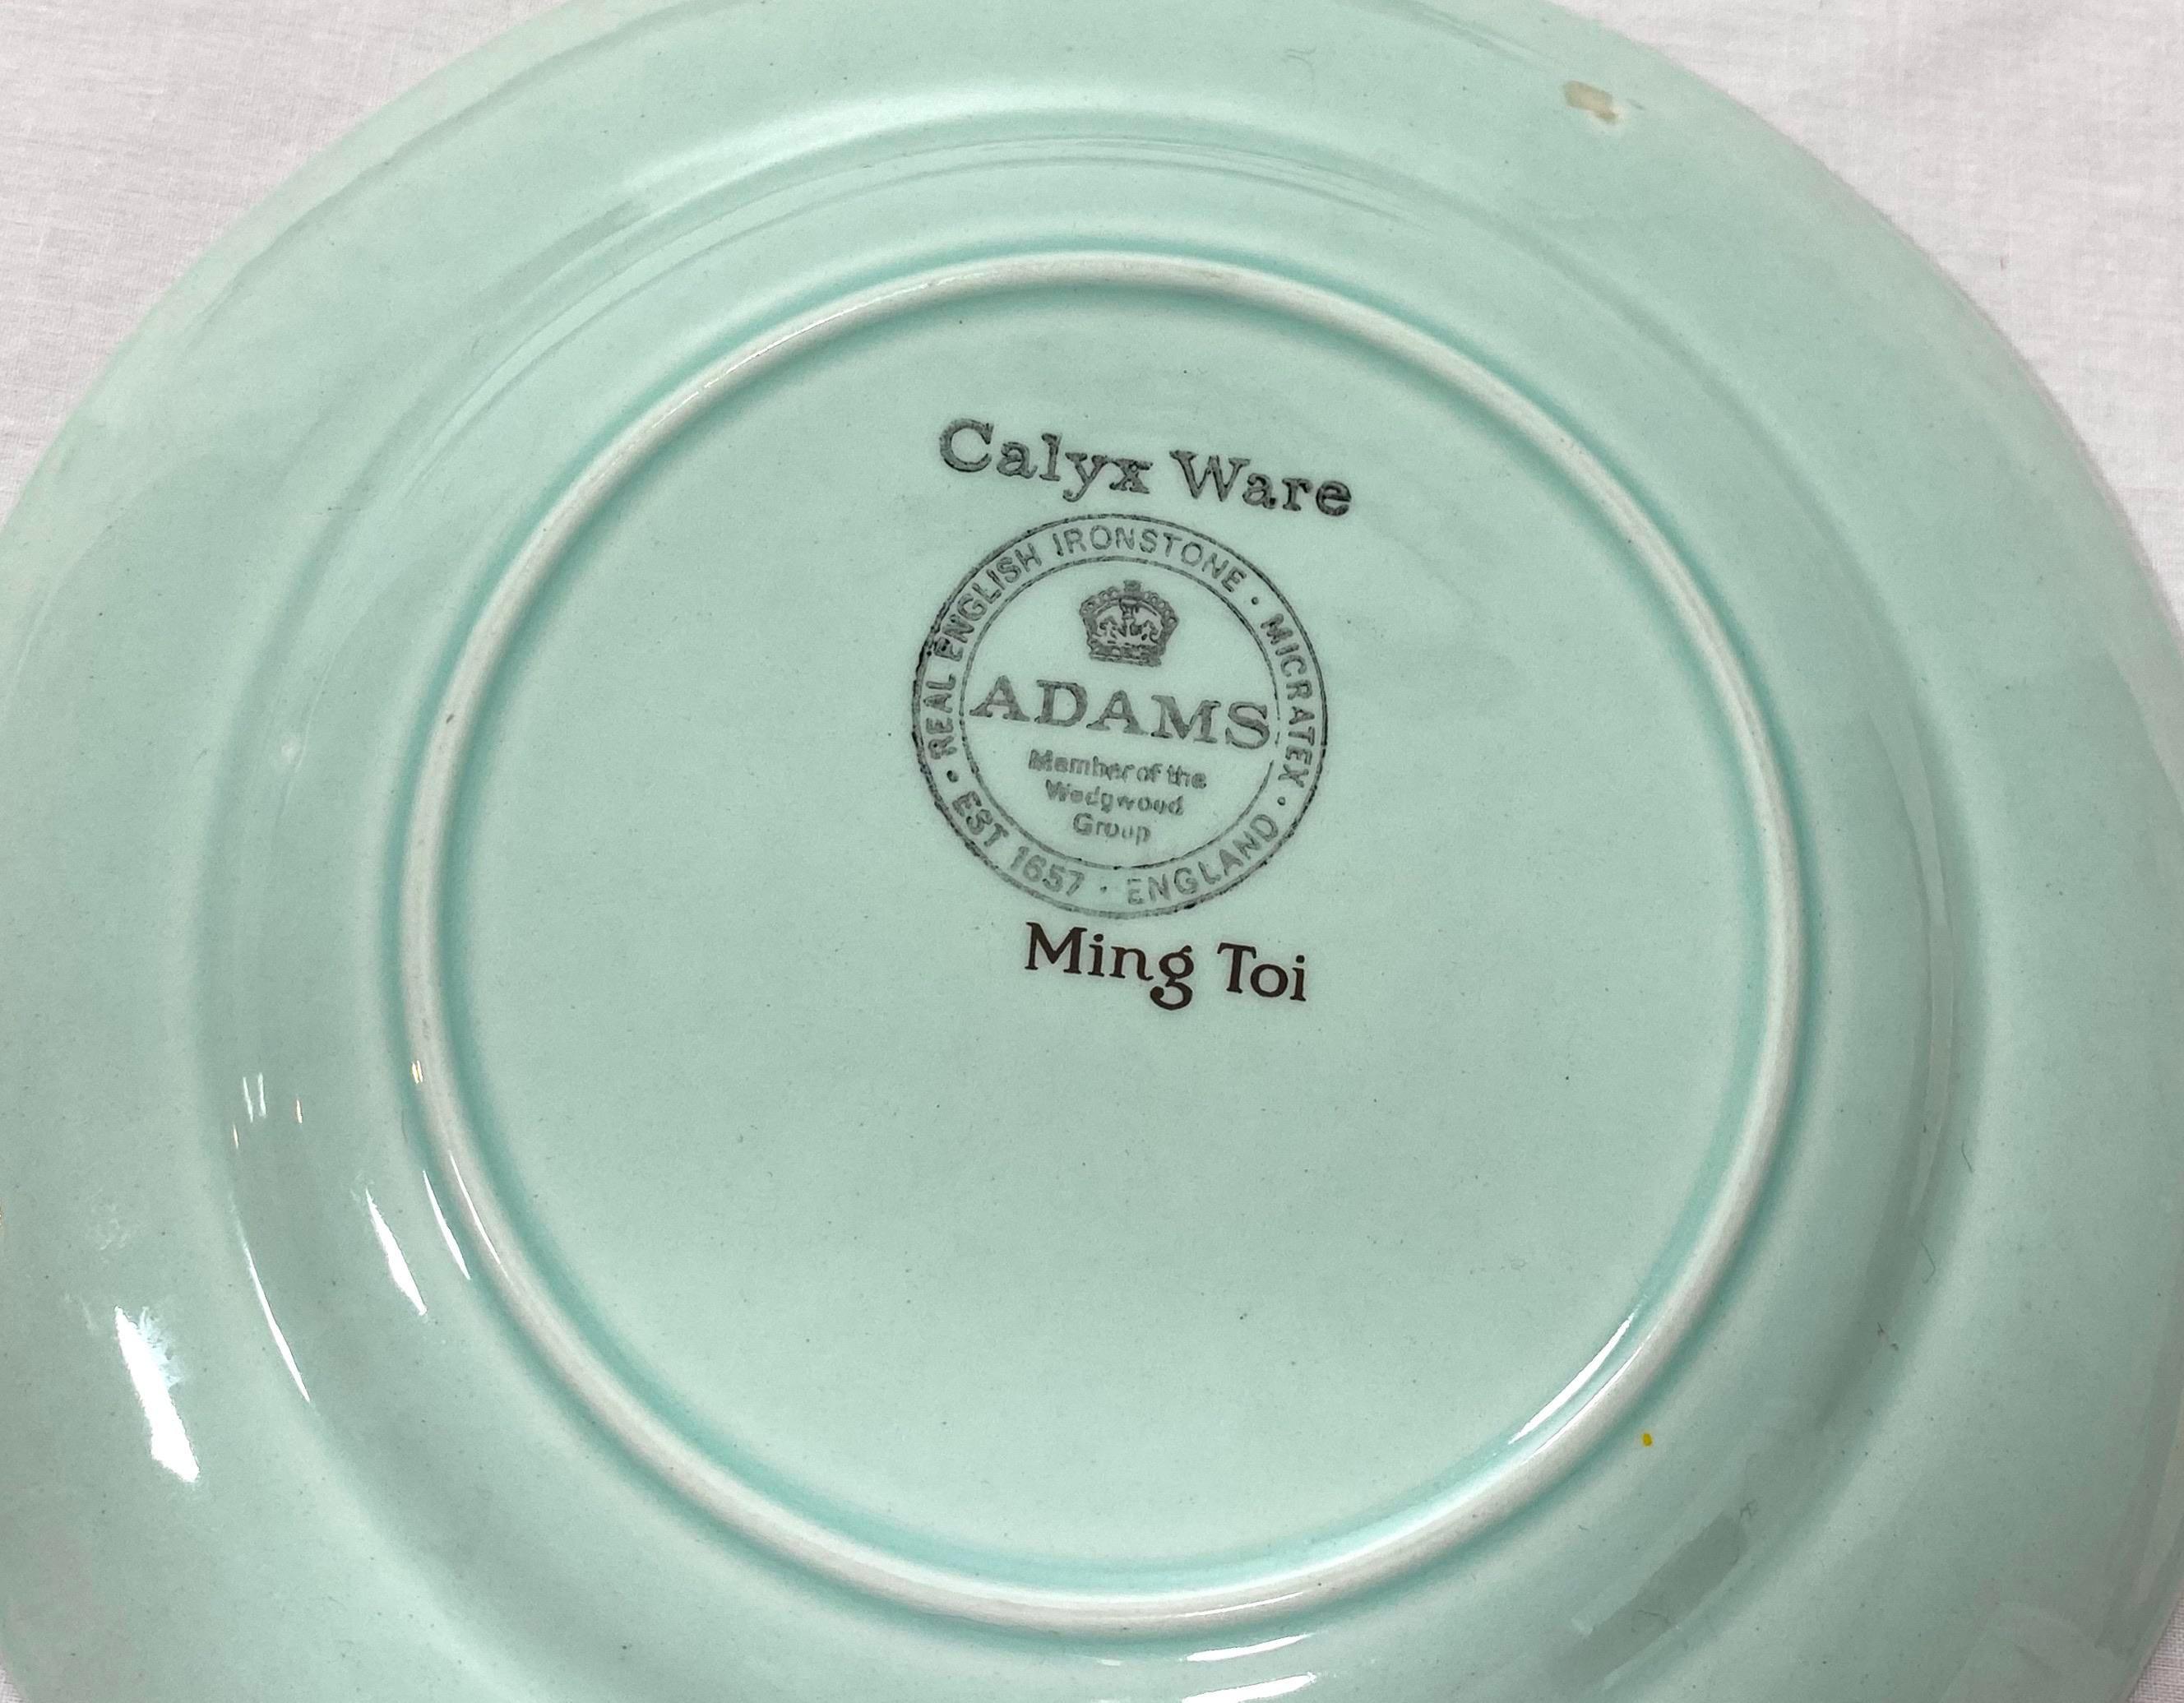 Adams Calyx Ware Ming Toi PLATO 26cm Diámetro hecho En Inglaterra 1968-vgcondtn